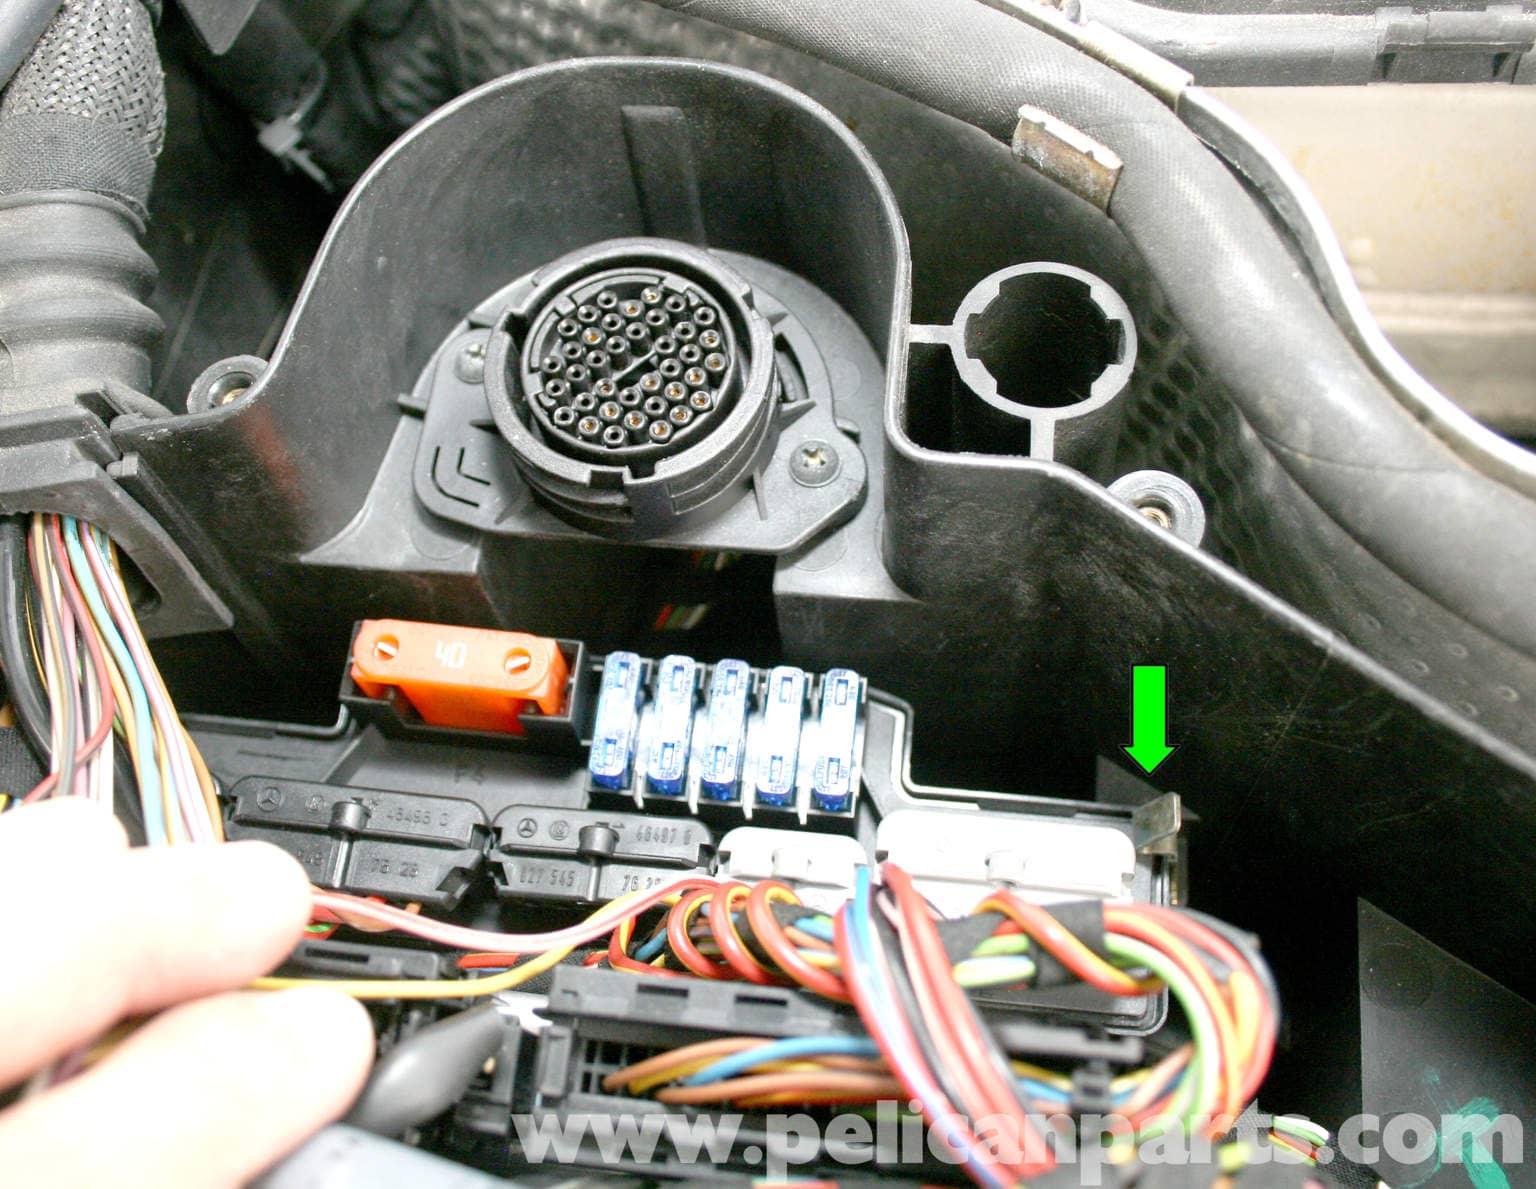 Mercedes Benz Slk 230 K40 Overload Protection Relay Repair